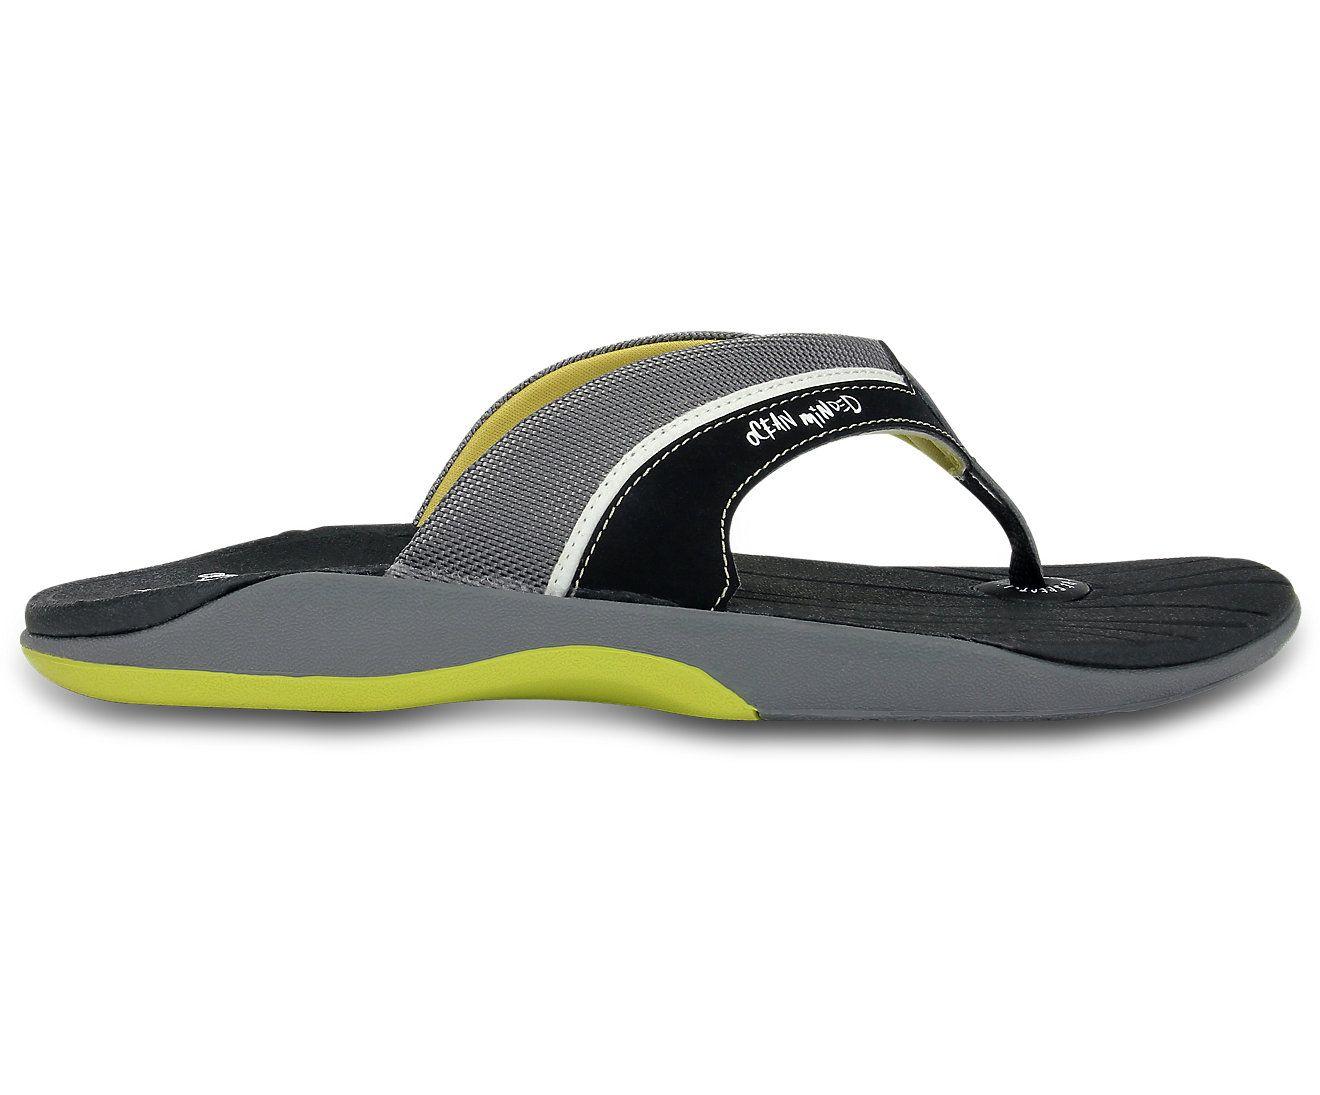 men s seaweed iii men s sandals flip flops. Black Bedroom Furniture Sets. Home Design Ideas